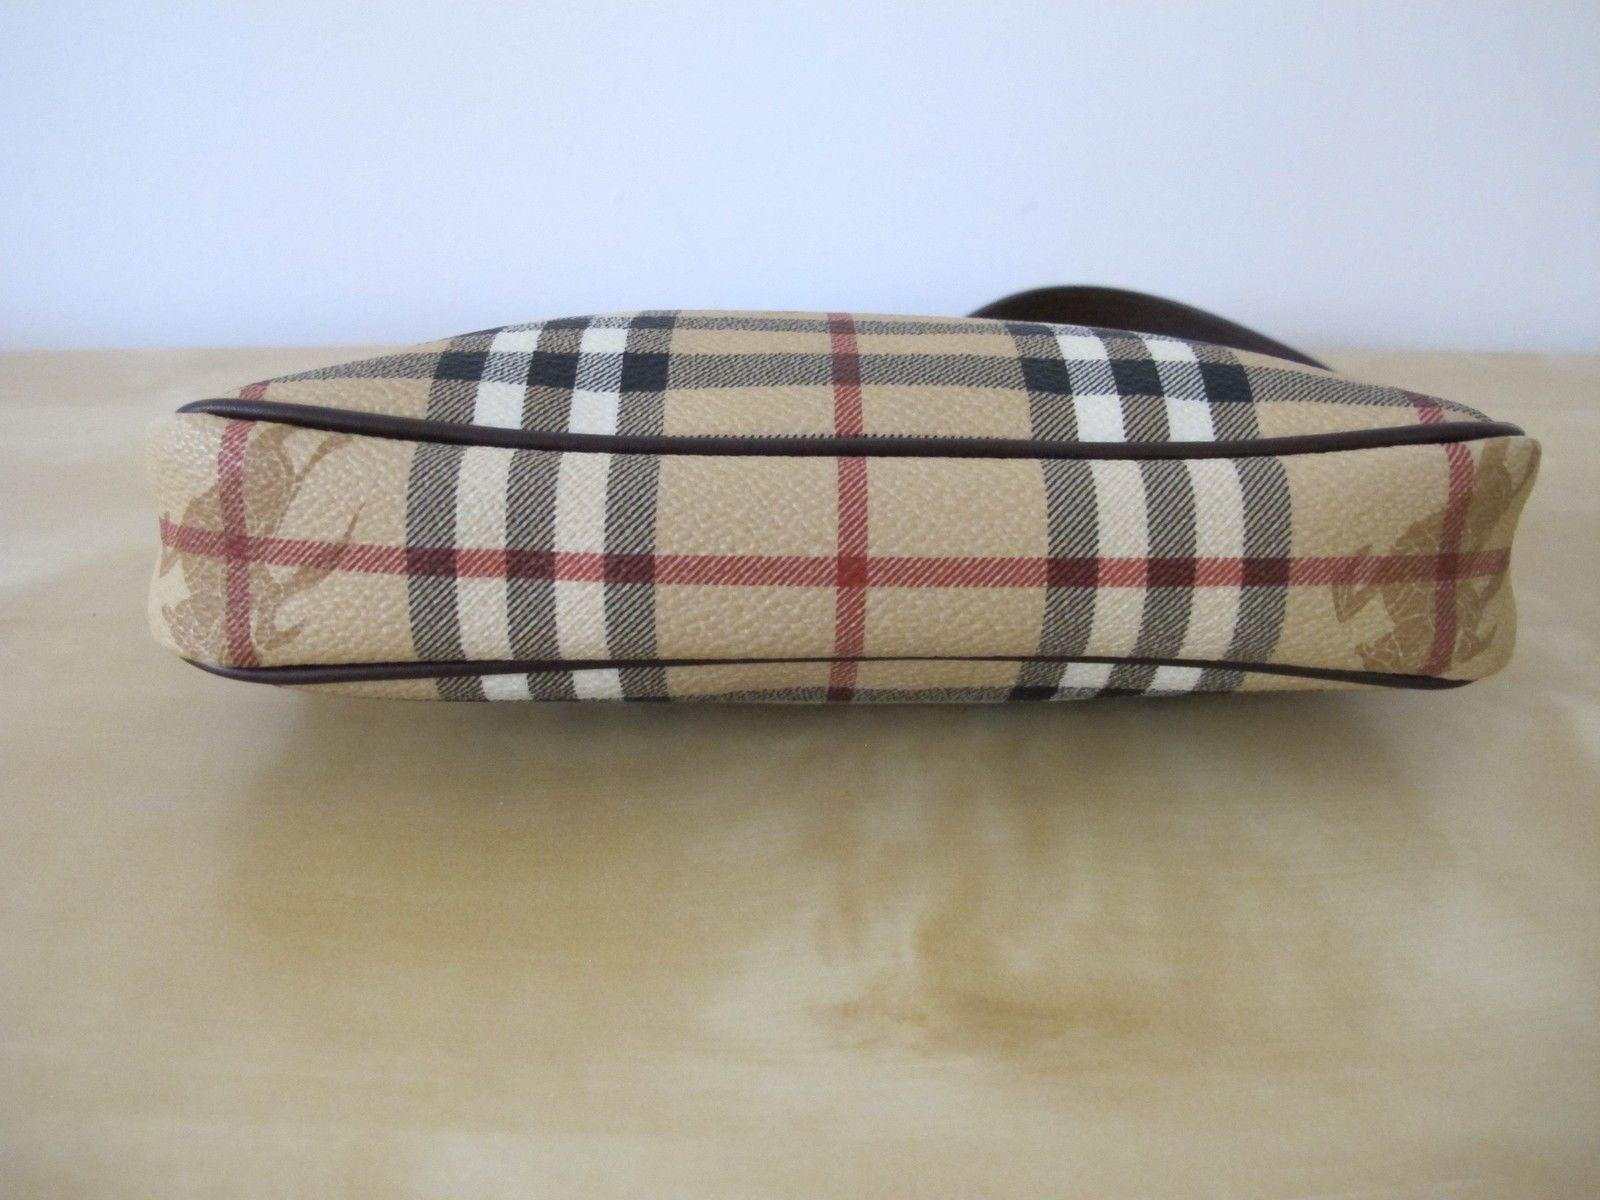 cddf160daca Burberry Nova Check Baguette Shoulder Bag - Luxurylana Boutique